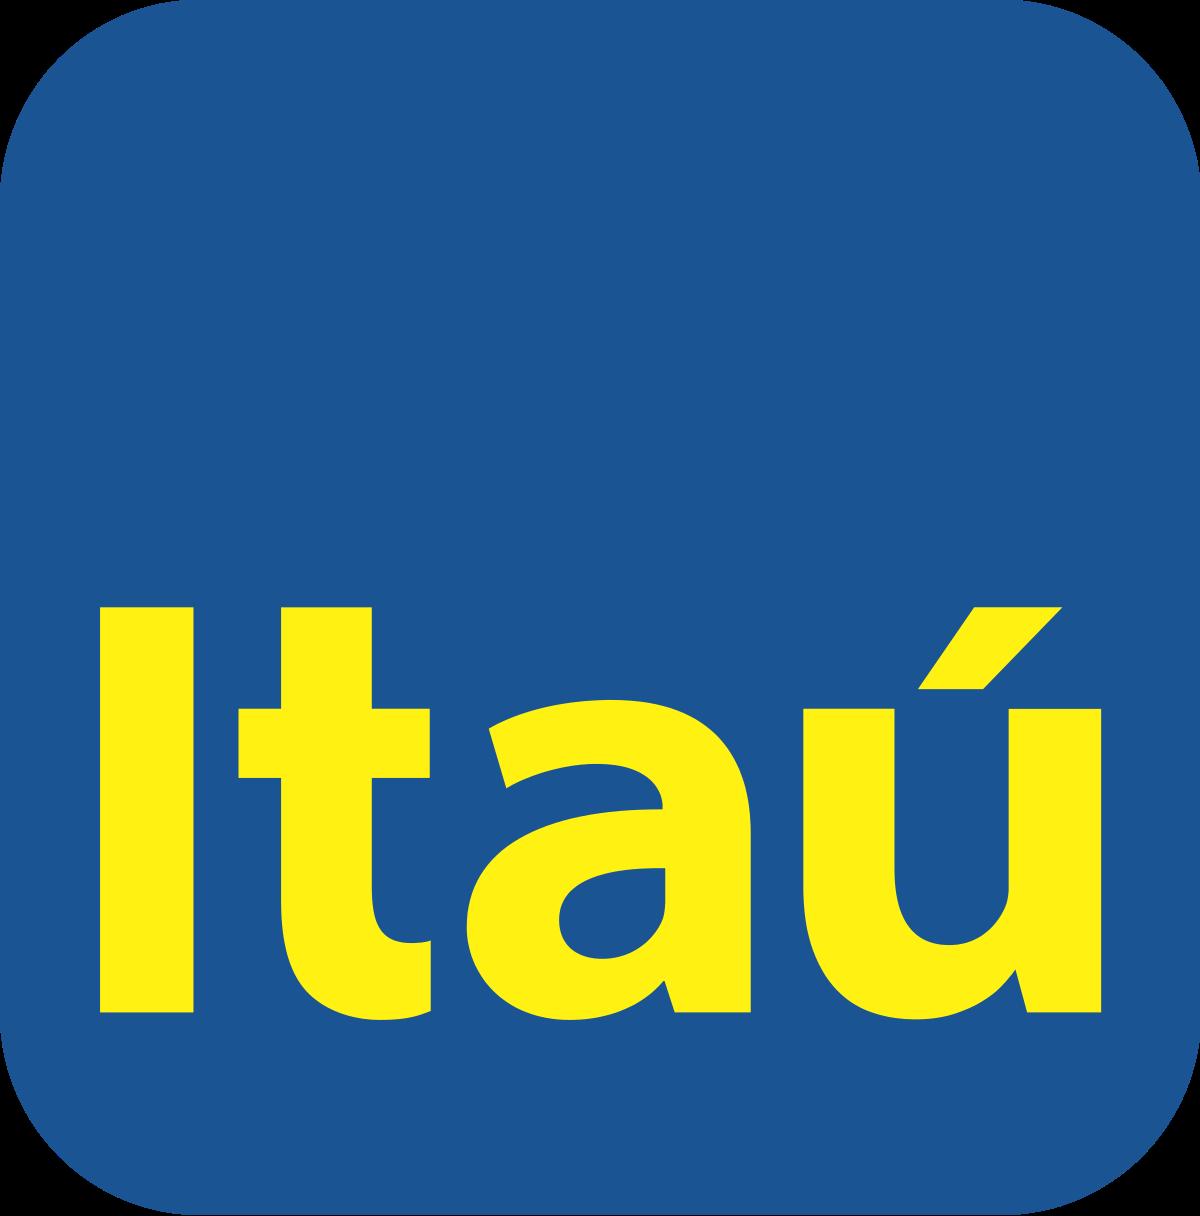 uploads/clientes/2021/05/logo-itau.png